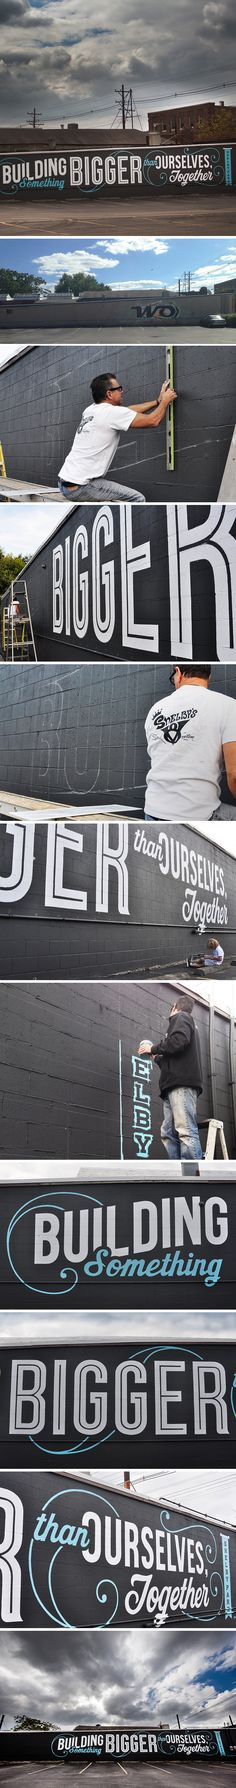 Bryan_patrick_todd_shelby_park_mural_drbbb2